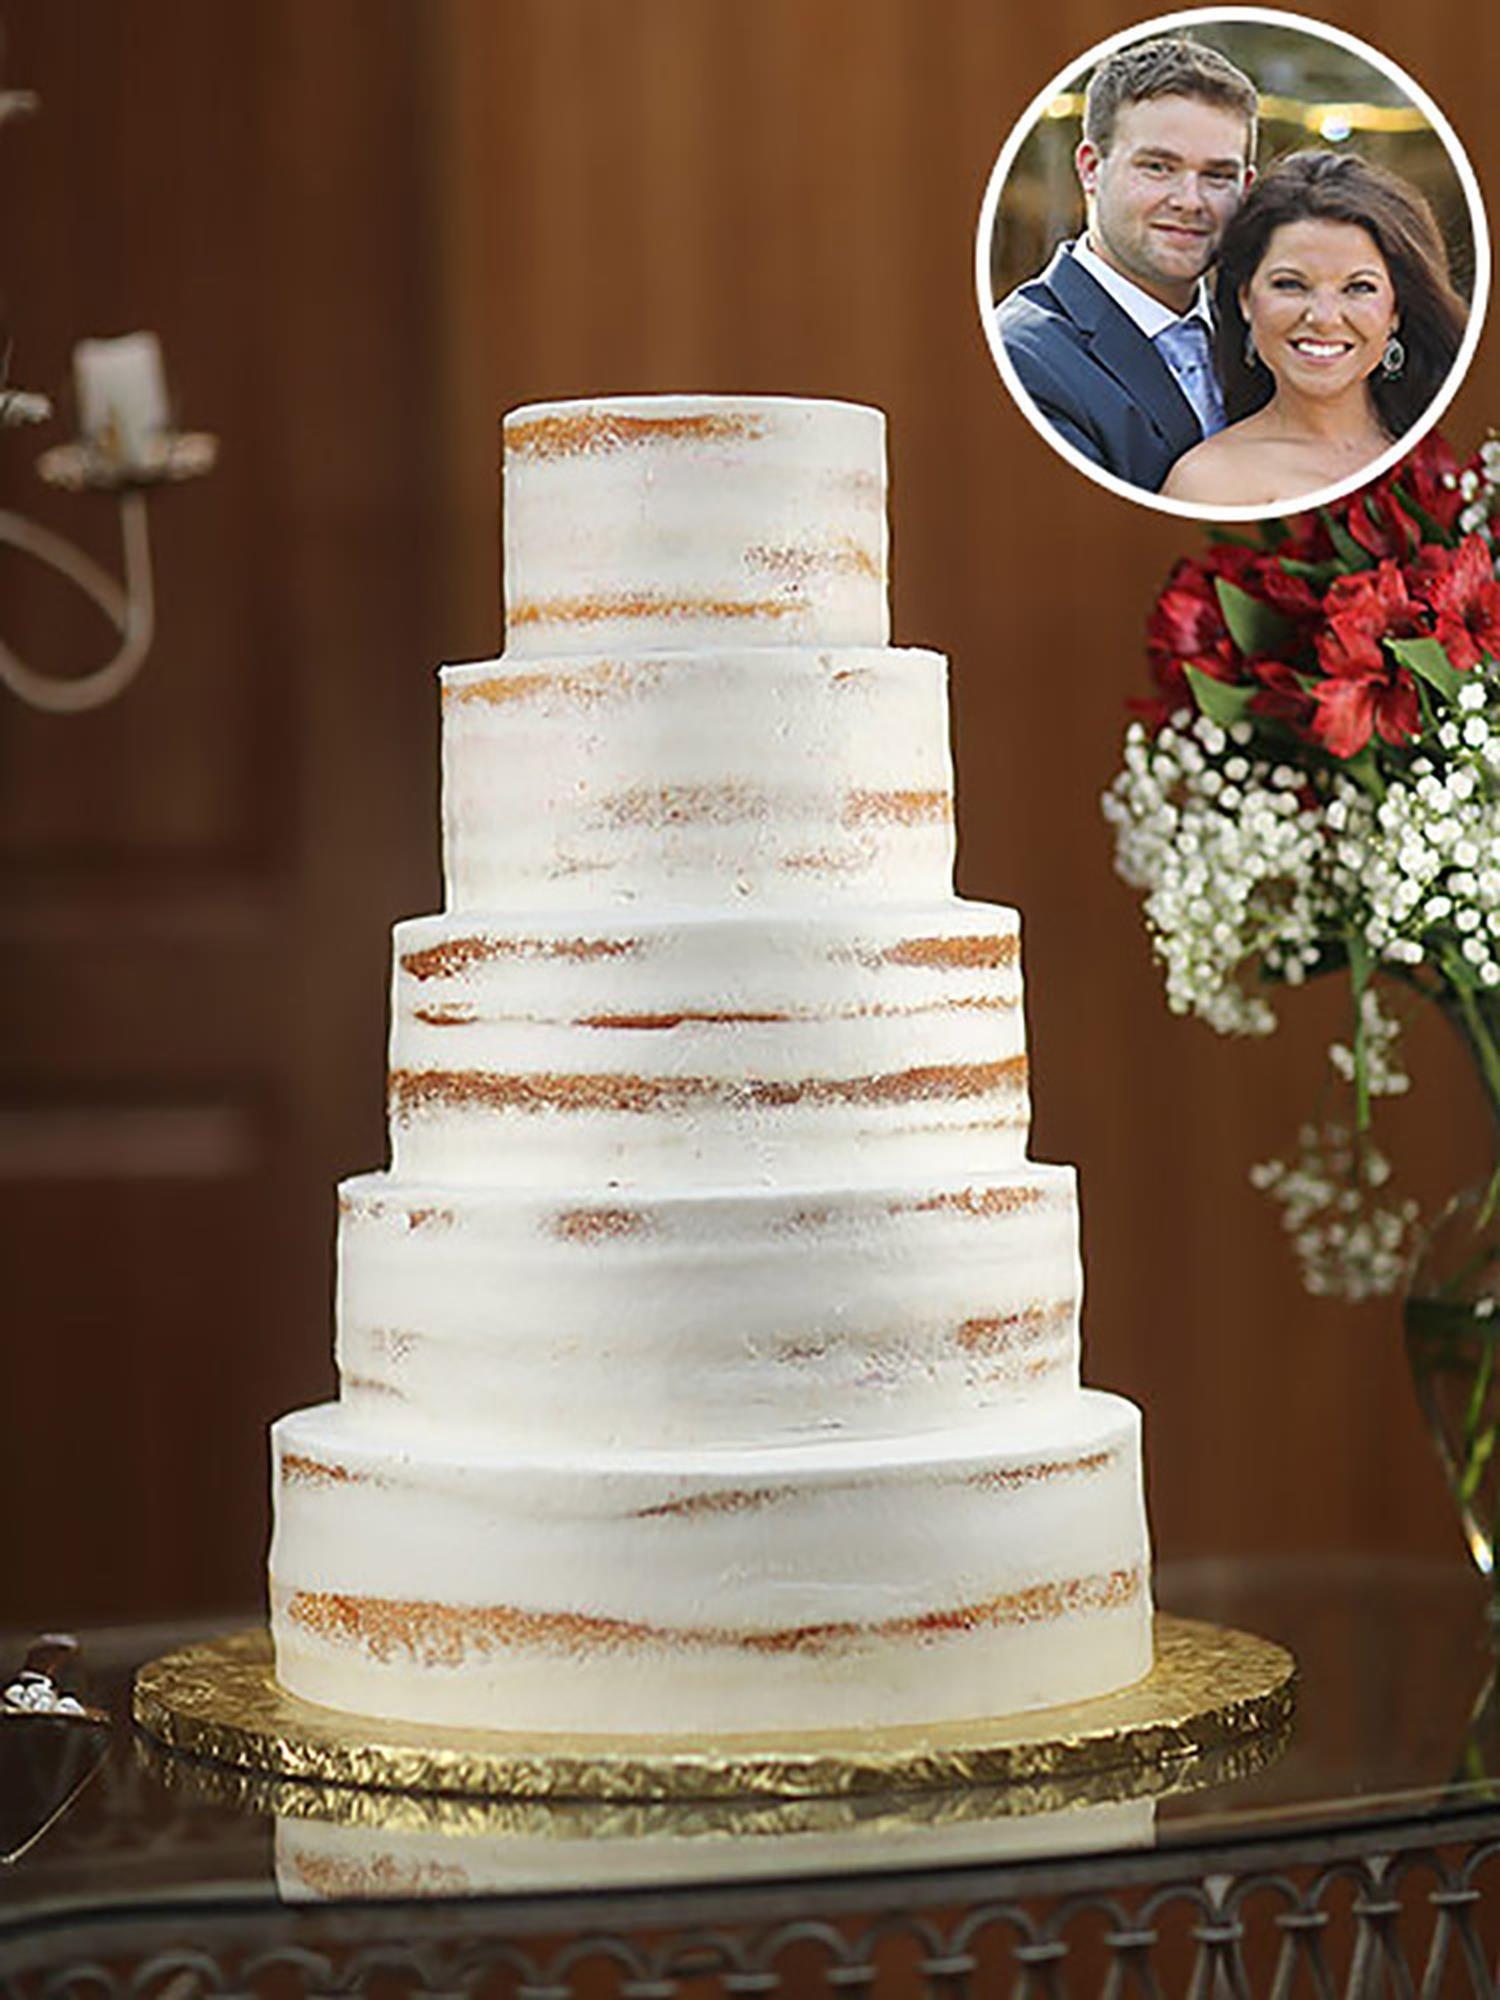 Wedding Cakes Simple Yahoo Image Search Results Wedding Cake Designs Wedding Cakes Wedding Cake Strain